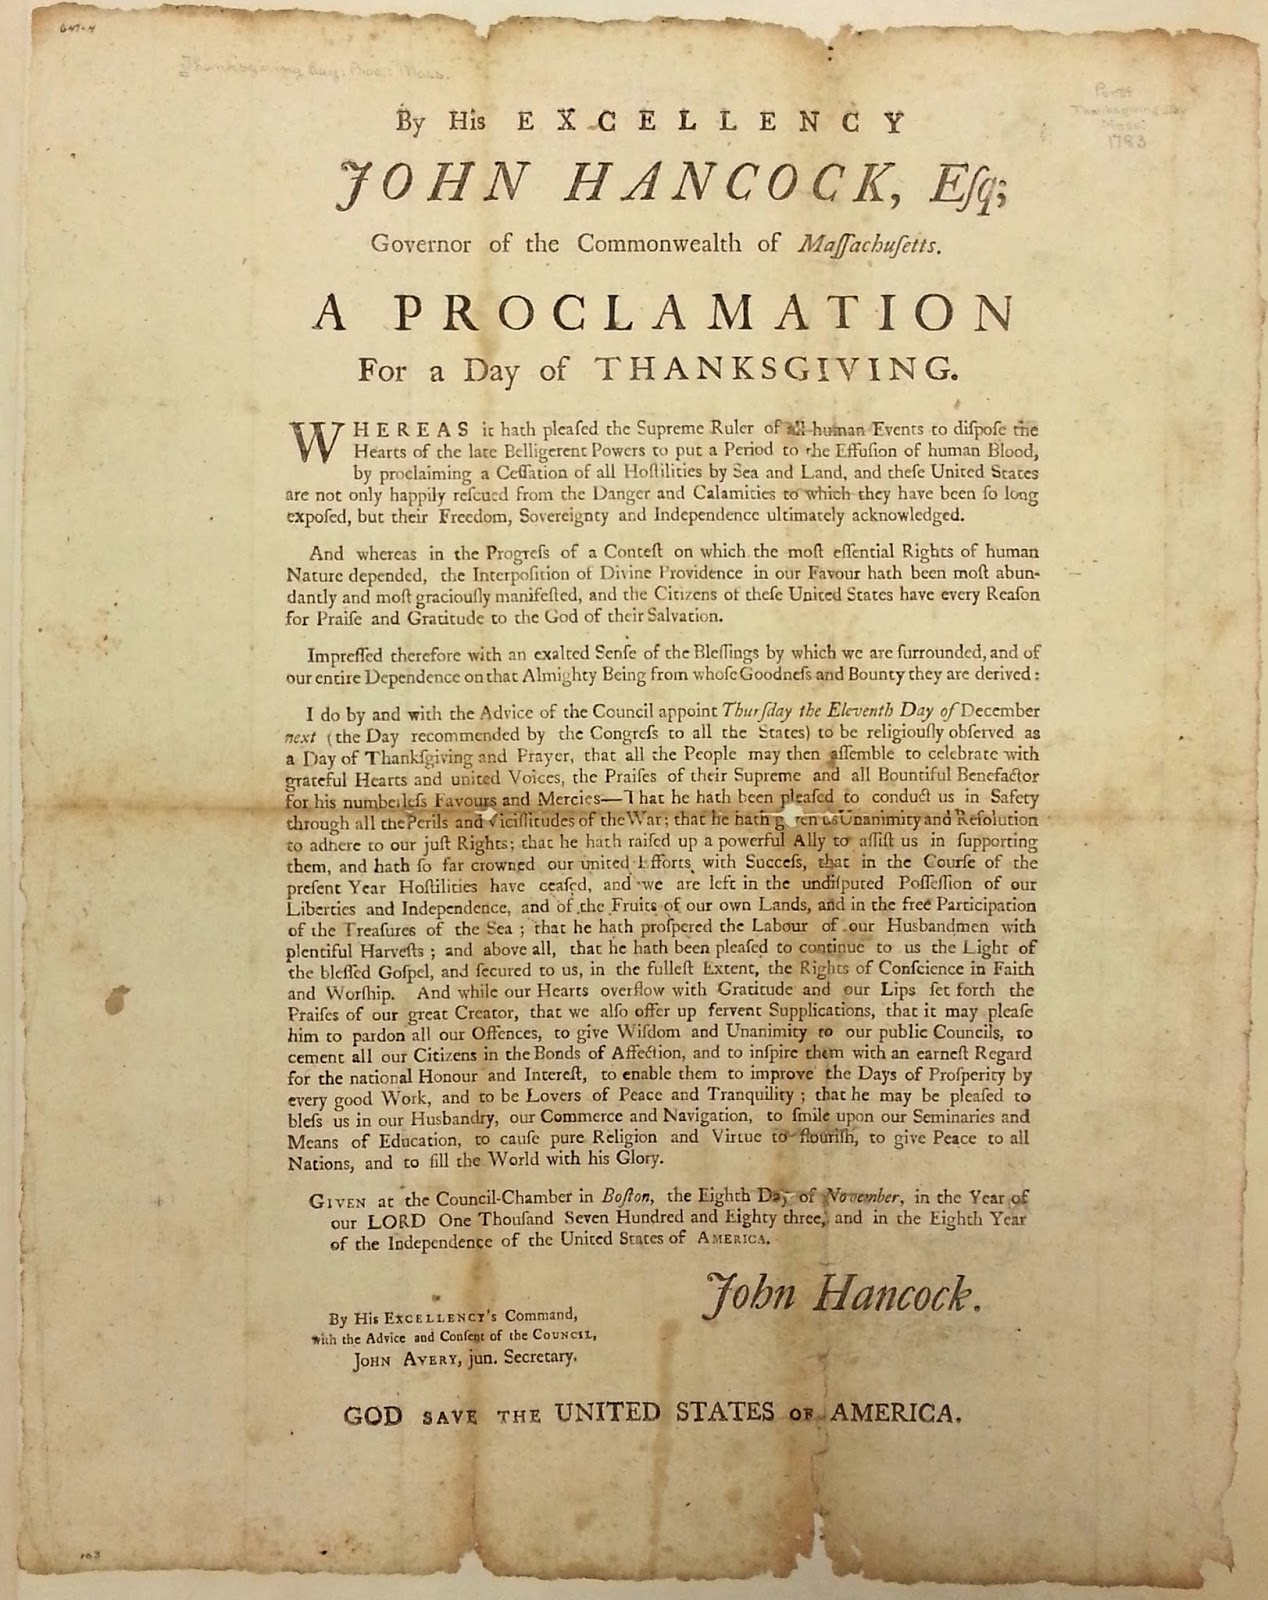 John Hancock Proclamation